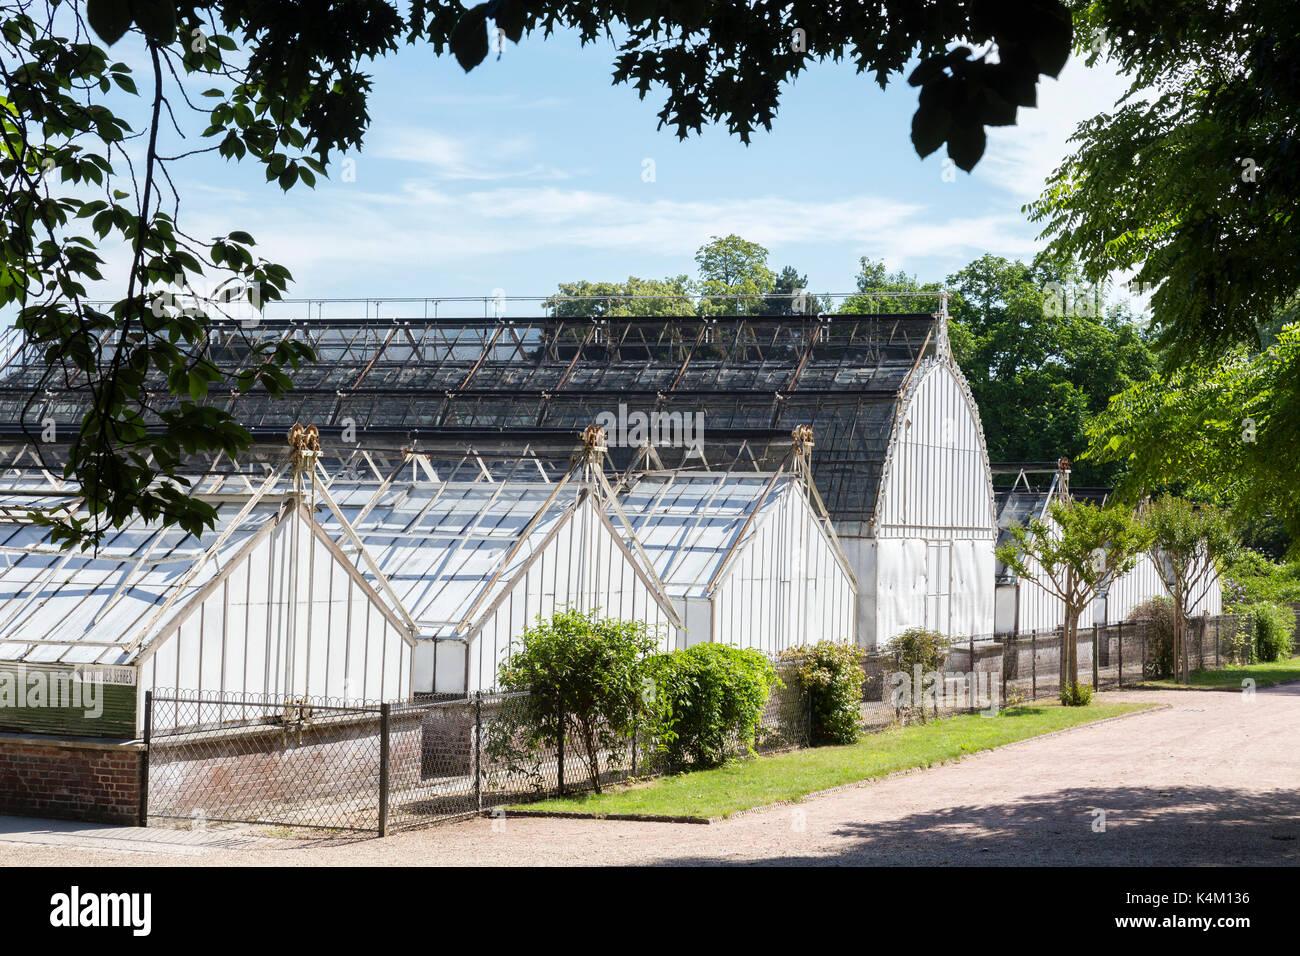 Serres stock photos serres stock images alamy for Le jardin des plantes